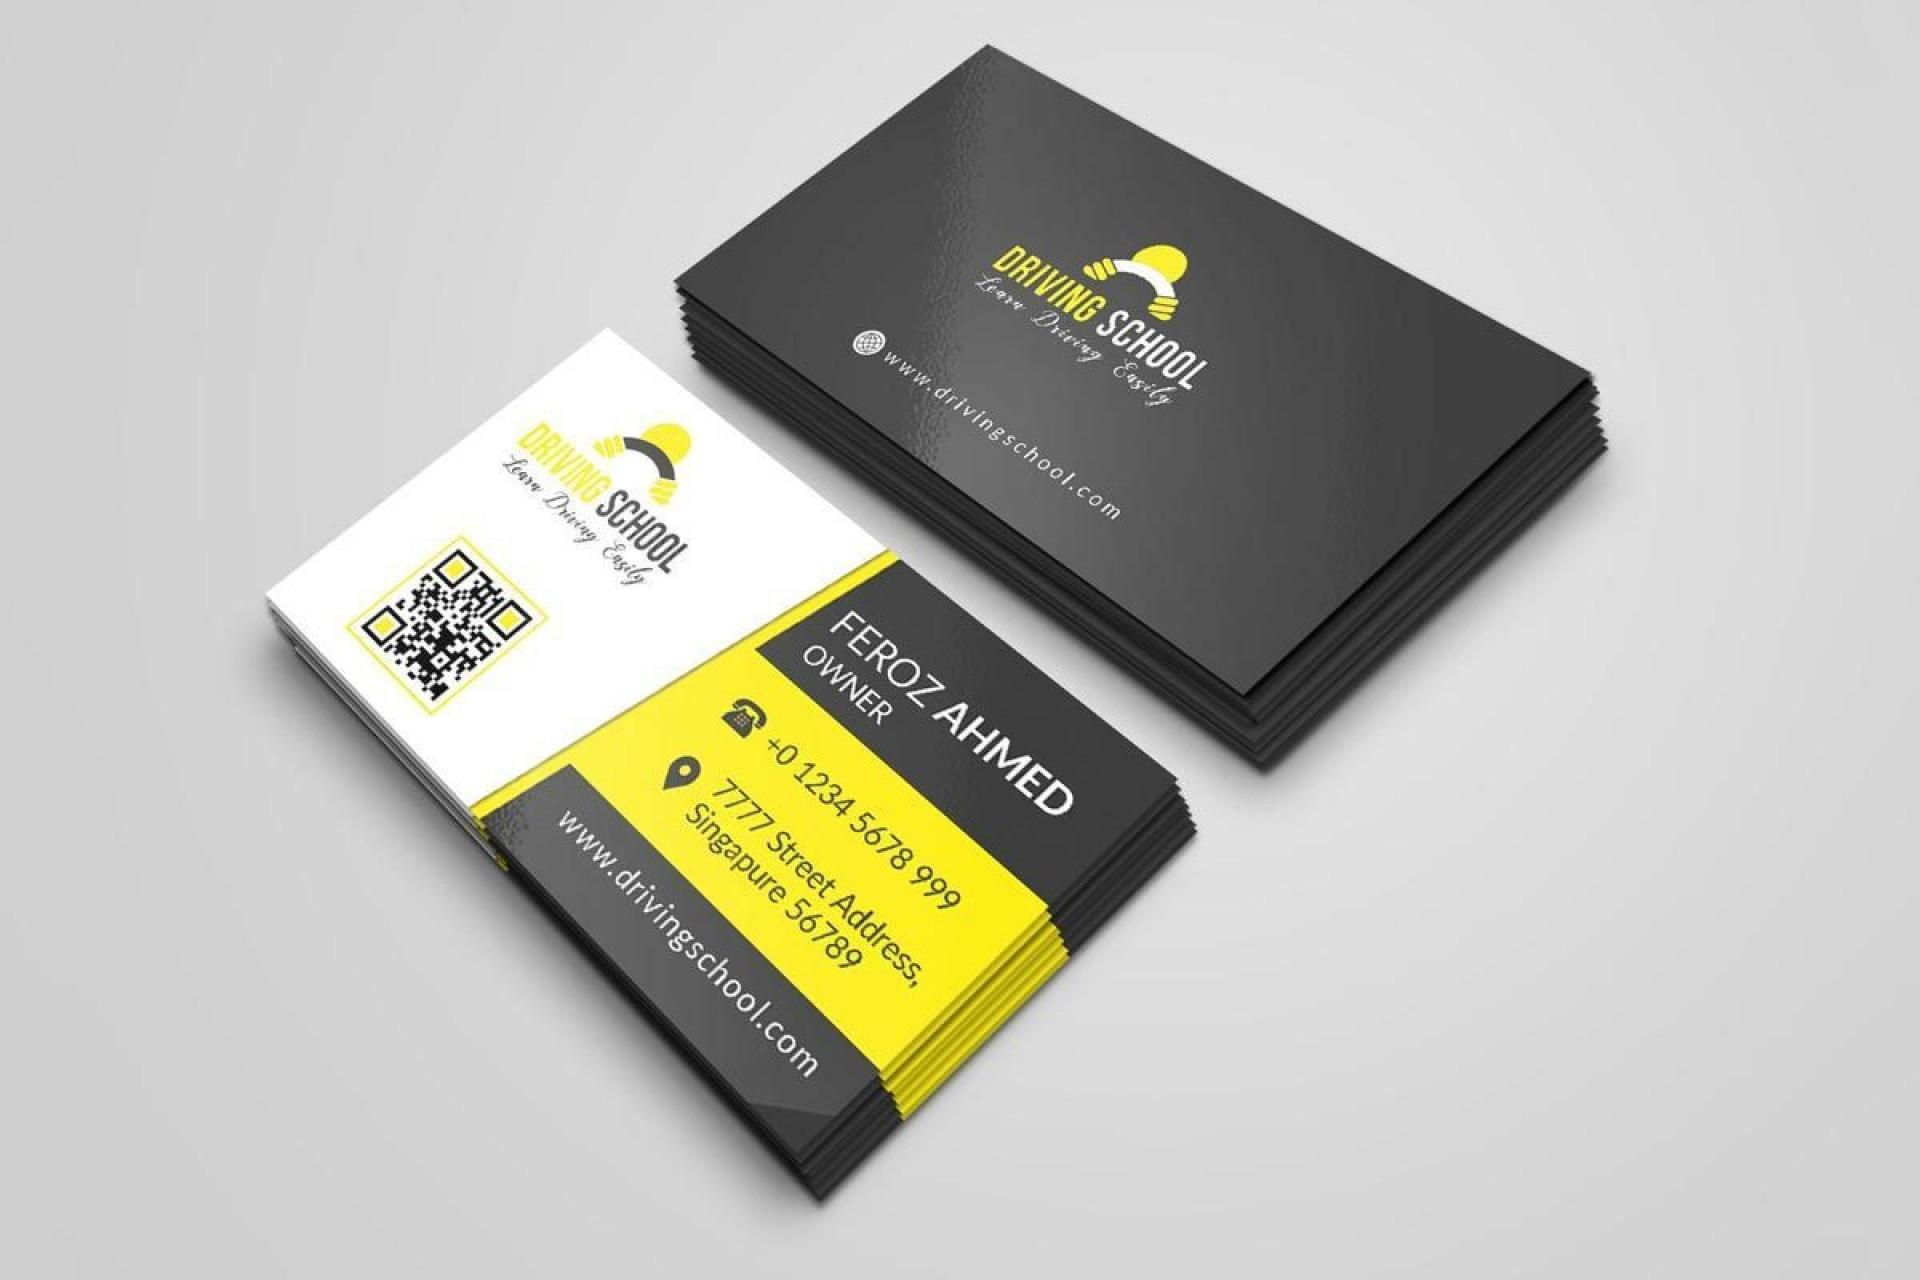 002 Surprising Free Photoshop Busines Card Template Sample  Blank Download Adobe Psd Mockup1920